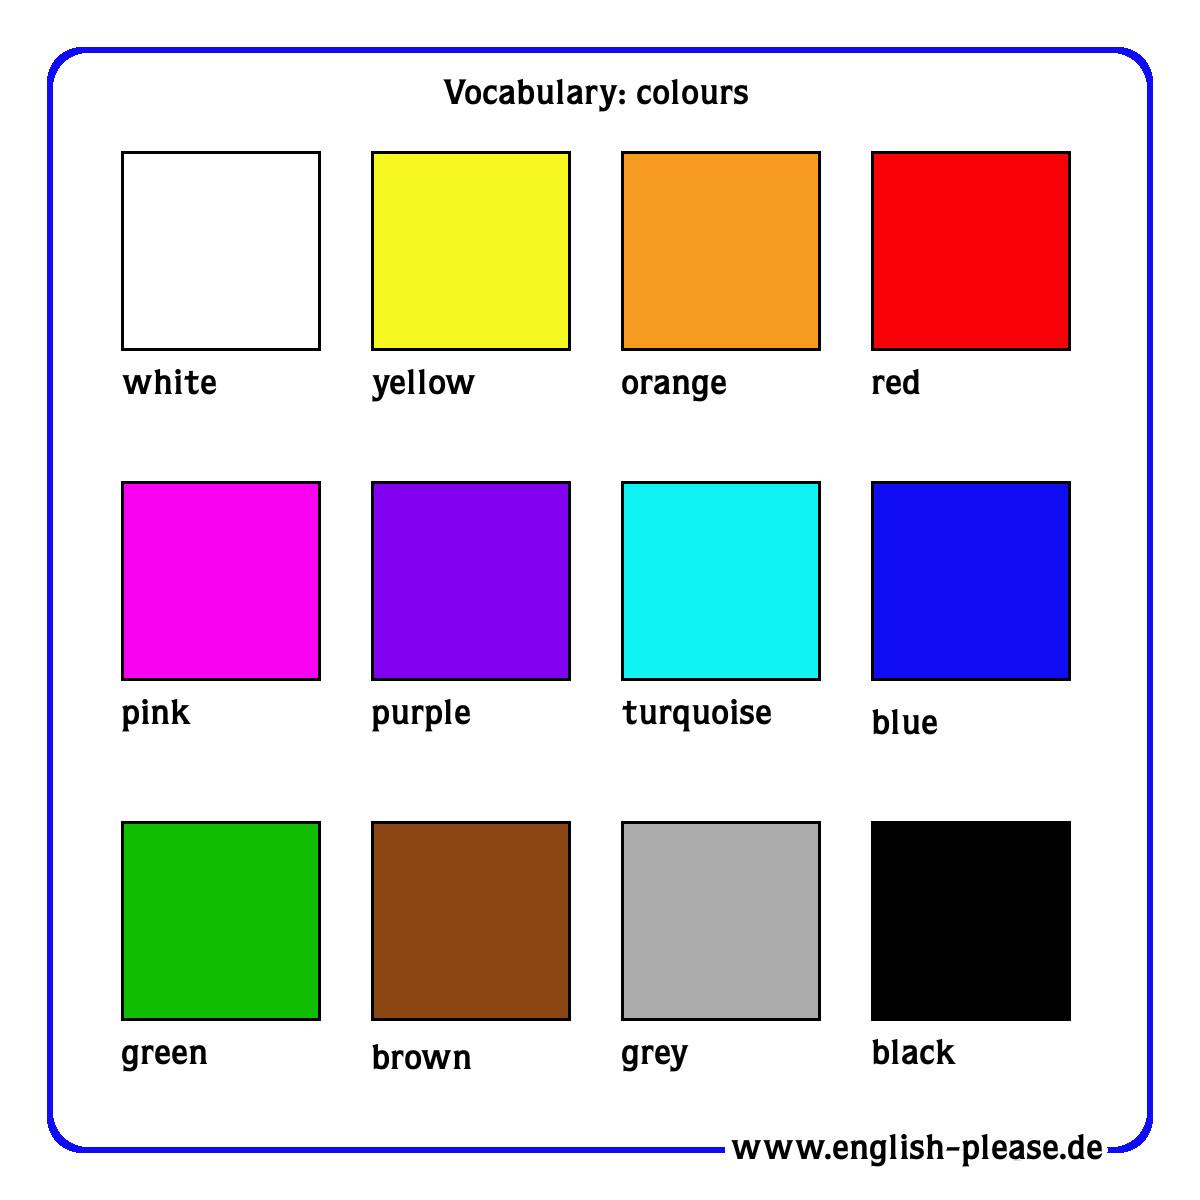 vocabulary colours madita piontek. Black Bedroom Furniture Sets. Home Design Ideas